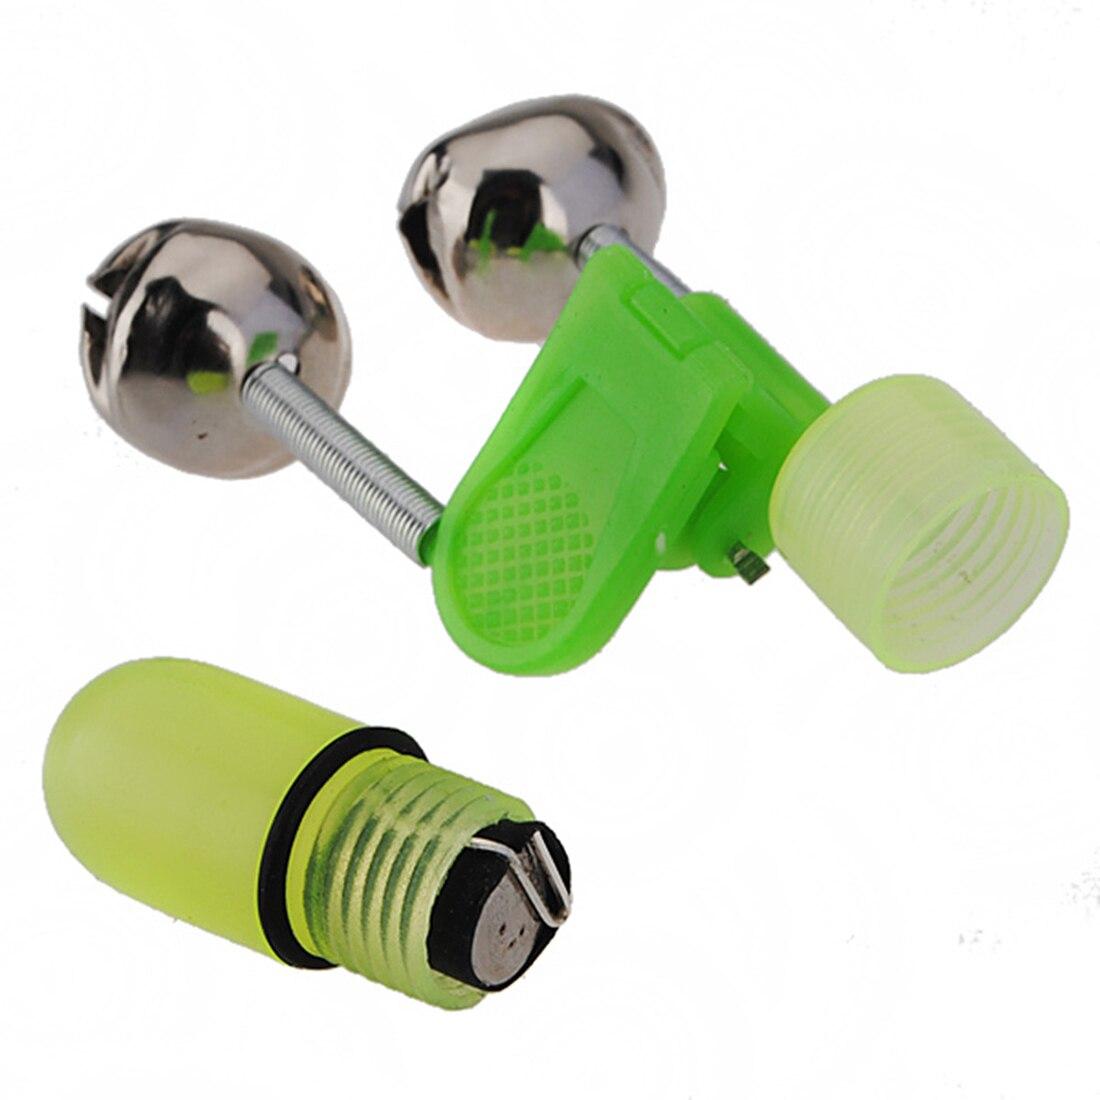 5x Lake Sea Fishing Rod Tip Bite Bell LED Light Indicator Clip Night Alarm Tool yellow-green